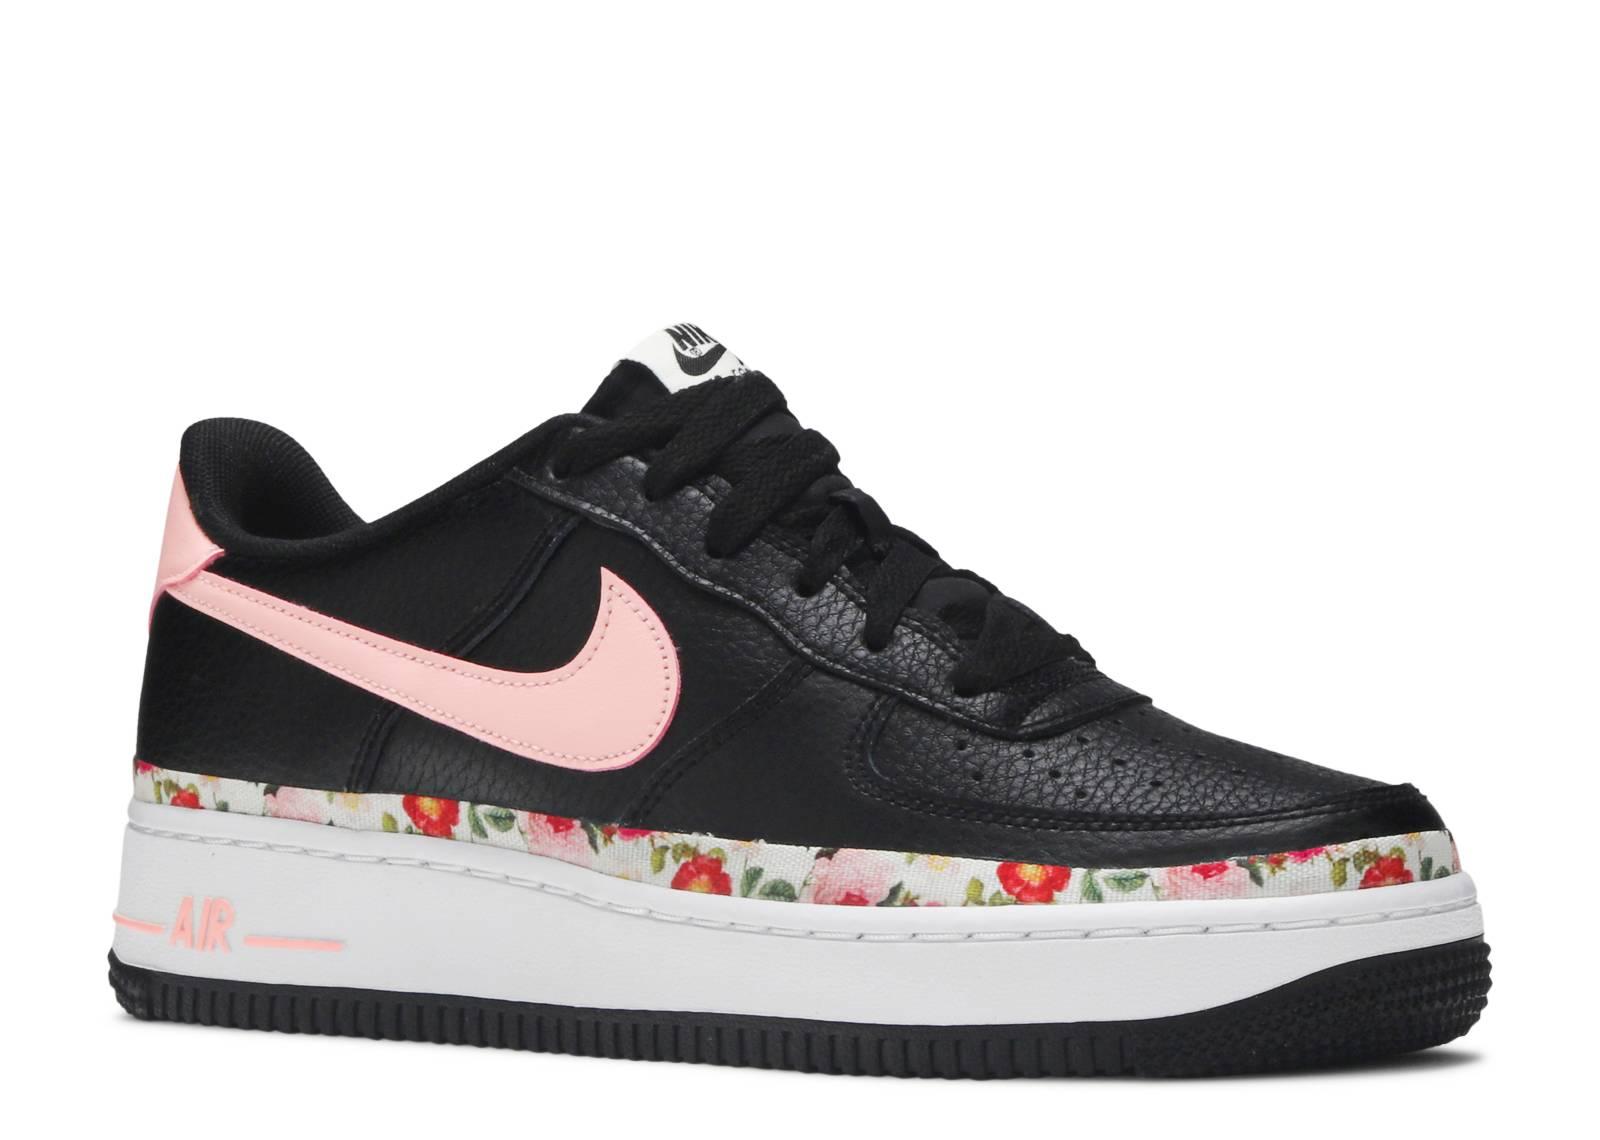 Air Force 1 Vintage Floral GS 'Pink Tint' - Nike - BQ2501 001 ...